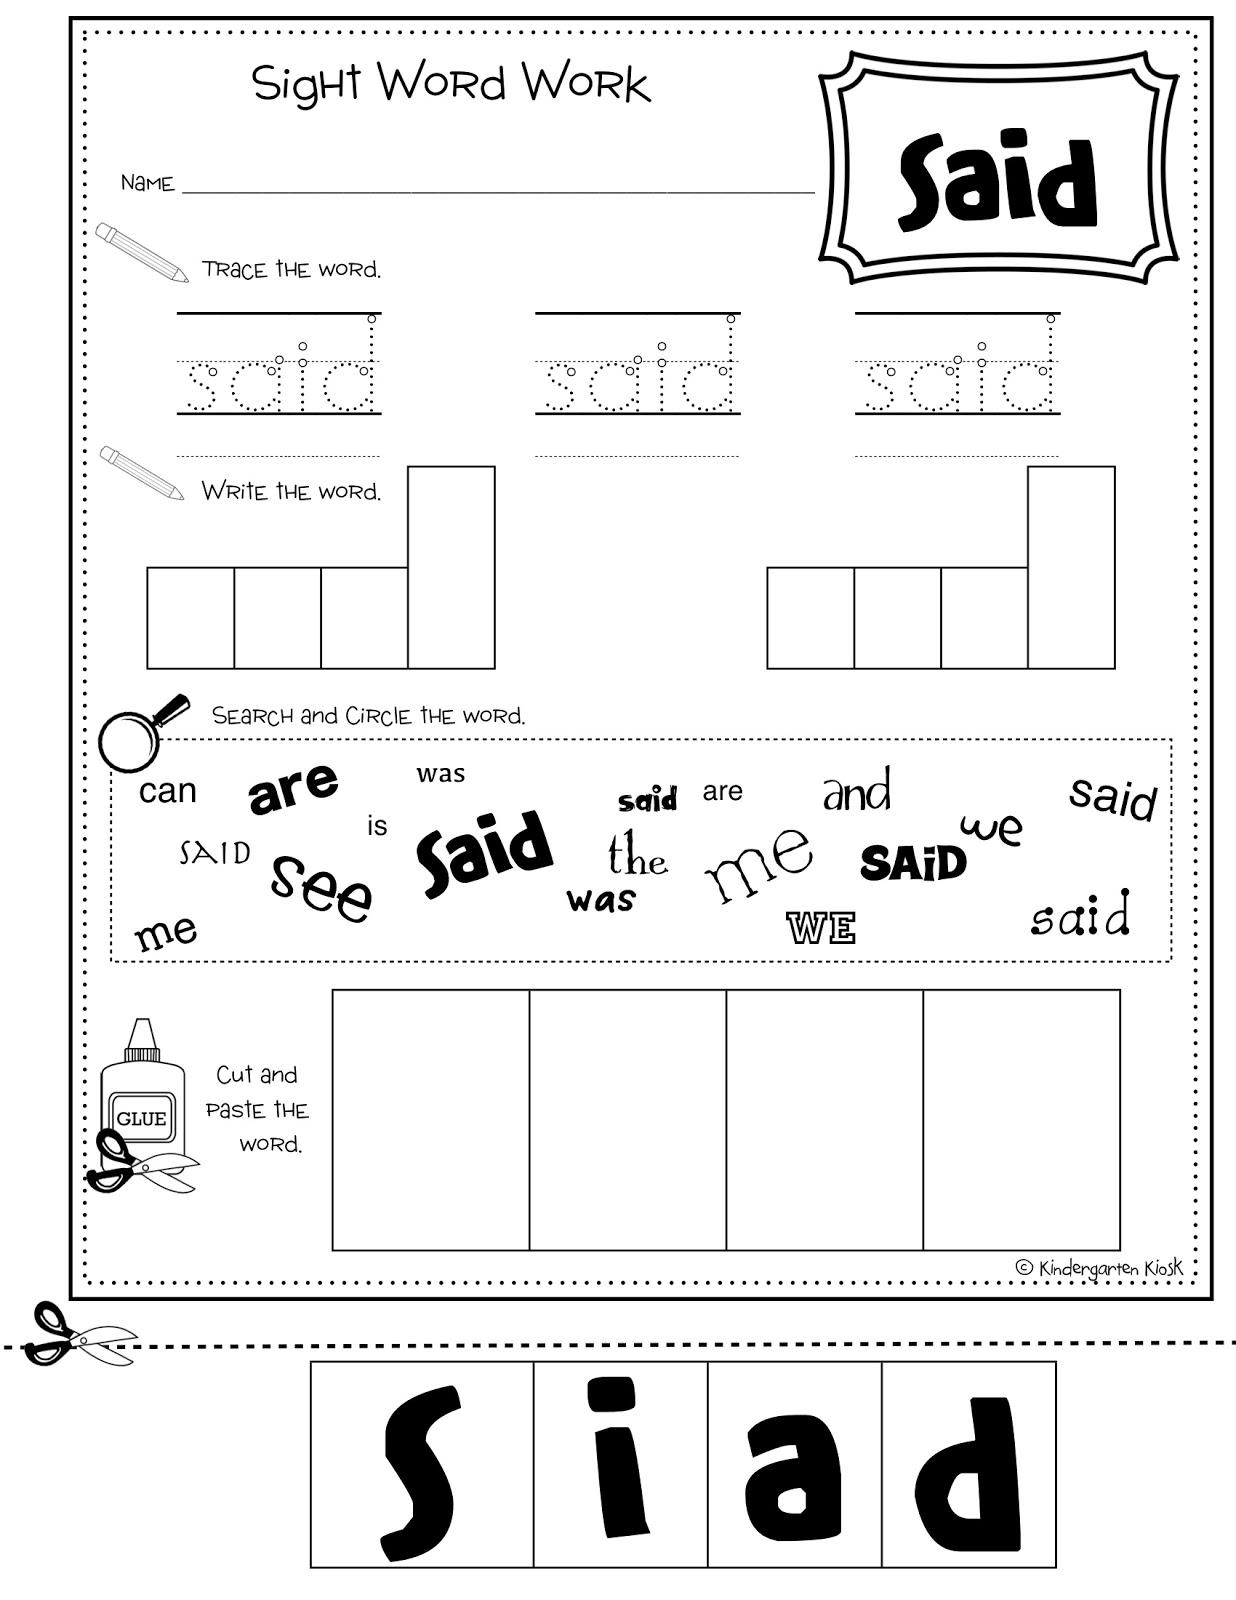 worksheet Said Worksheets new 190 sight word worksheet for said multi task kiosk kindergarten workbook word